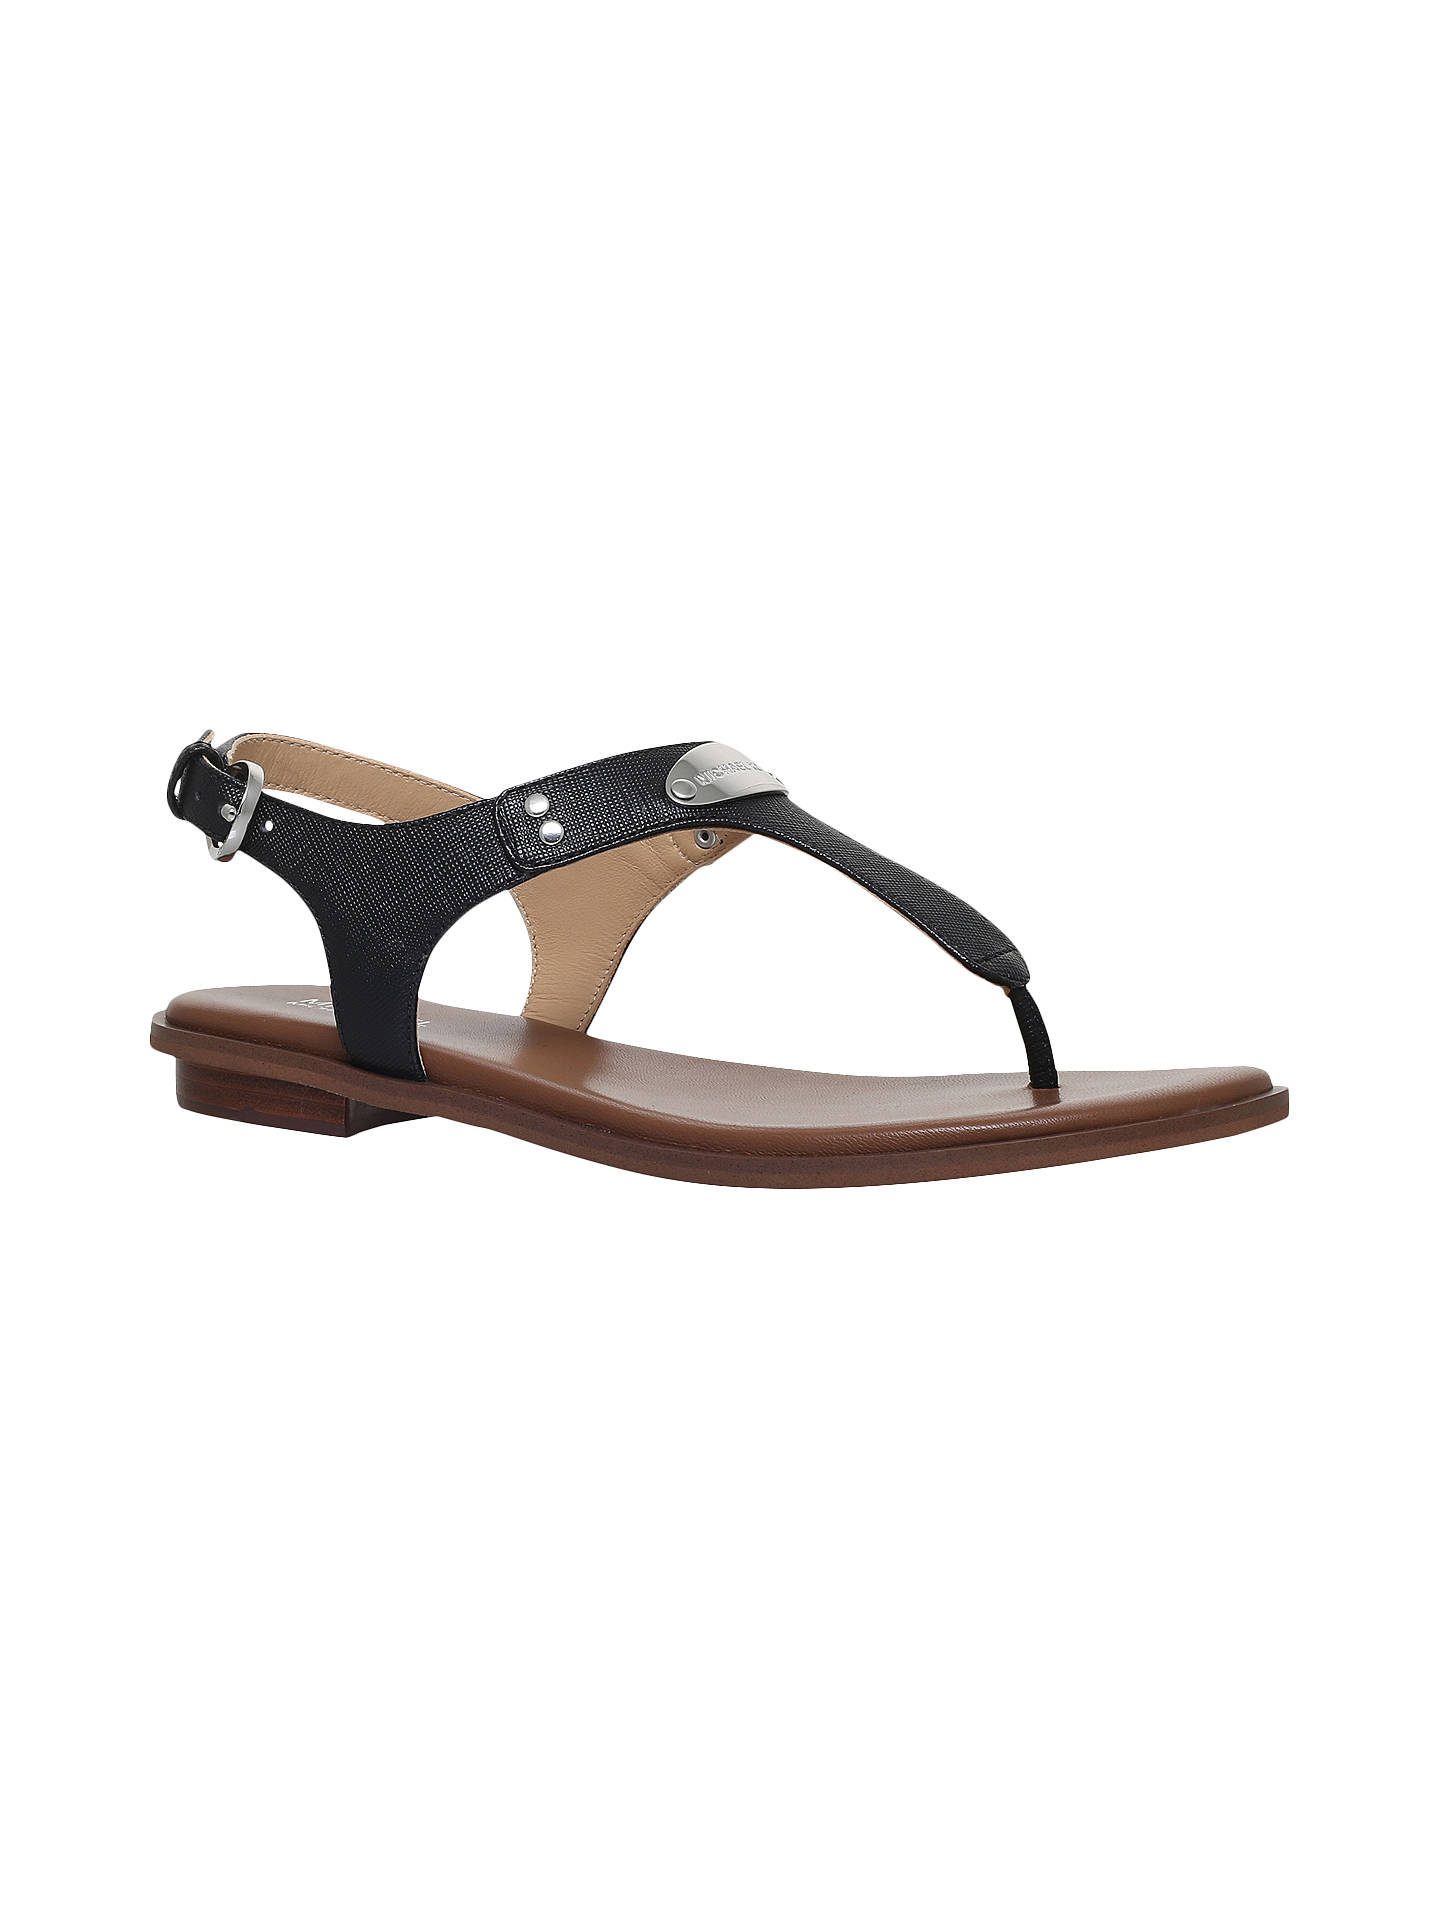 a6cb5c180834 MICHAEL Michael Kors MK Plate Toe Post Sandals at John Lewis   Partners